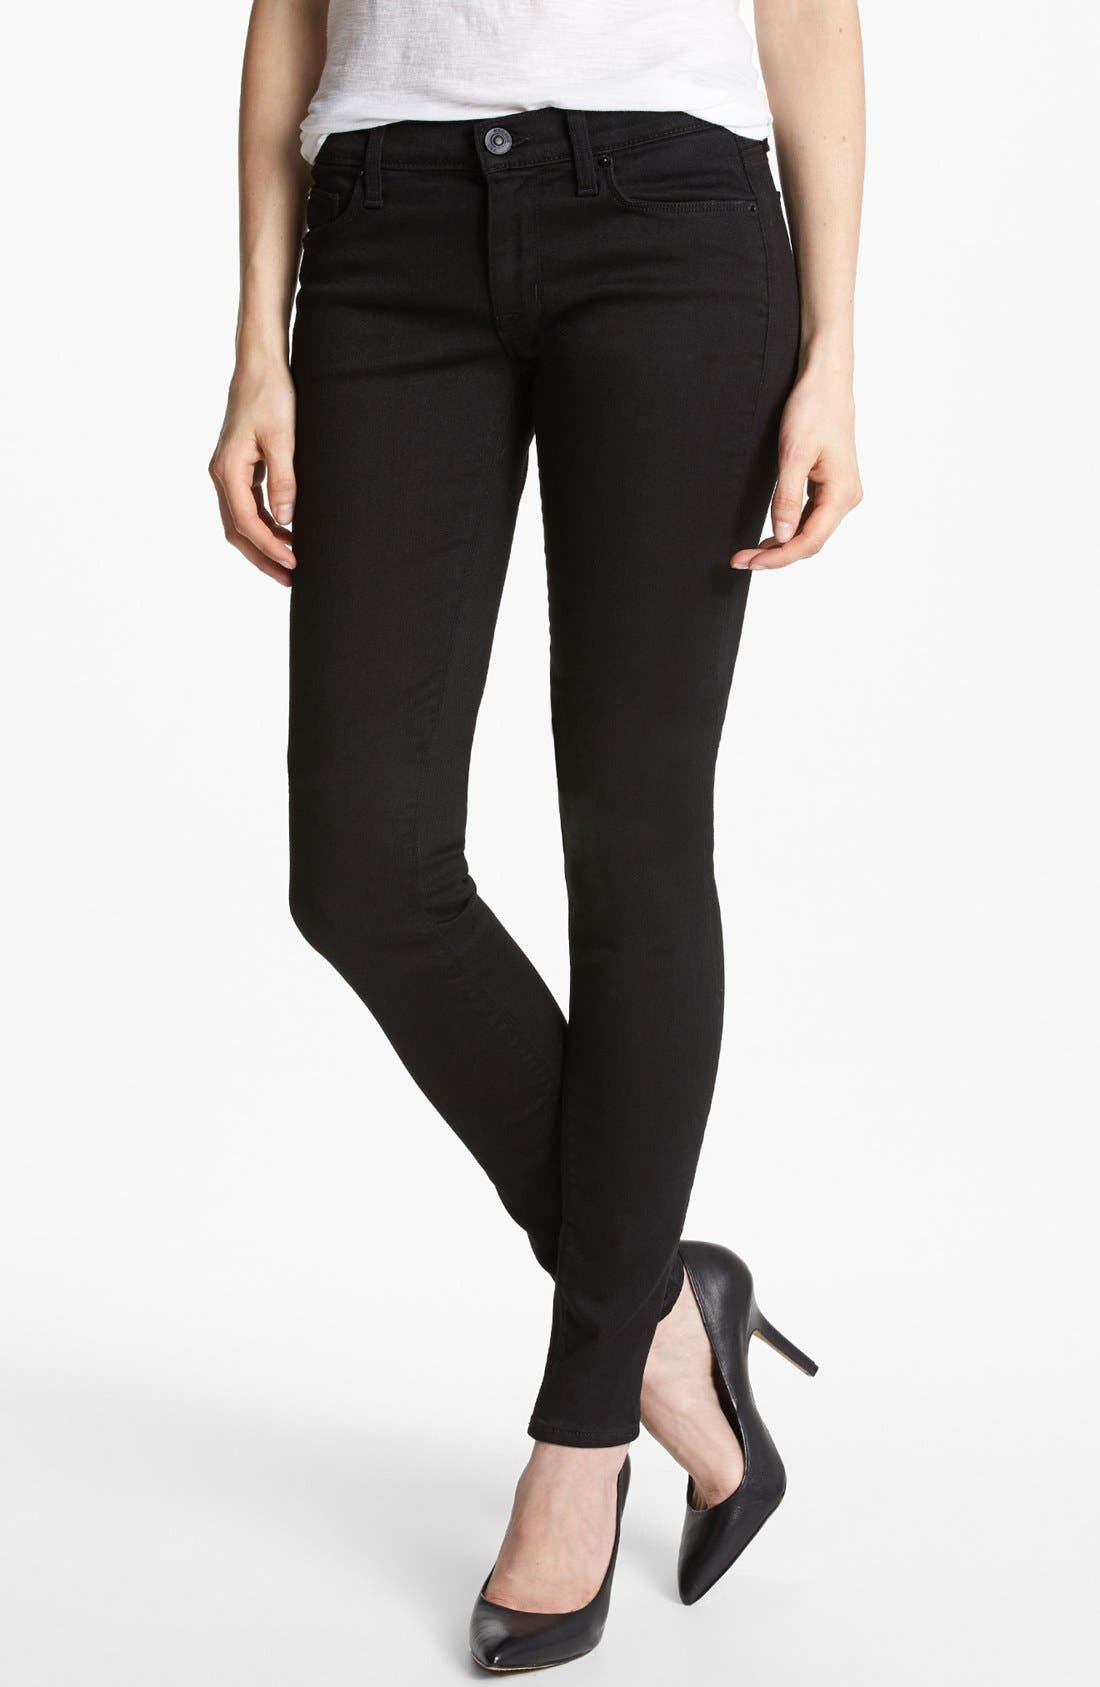 Alternate Image 1 Selected - Hudson Jeans 'Krista Supermodel' Skinny Jeans (Black)